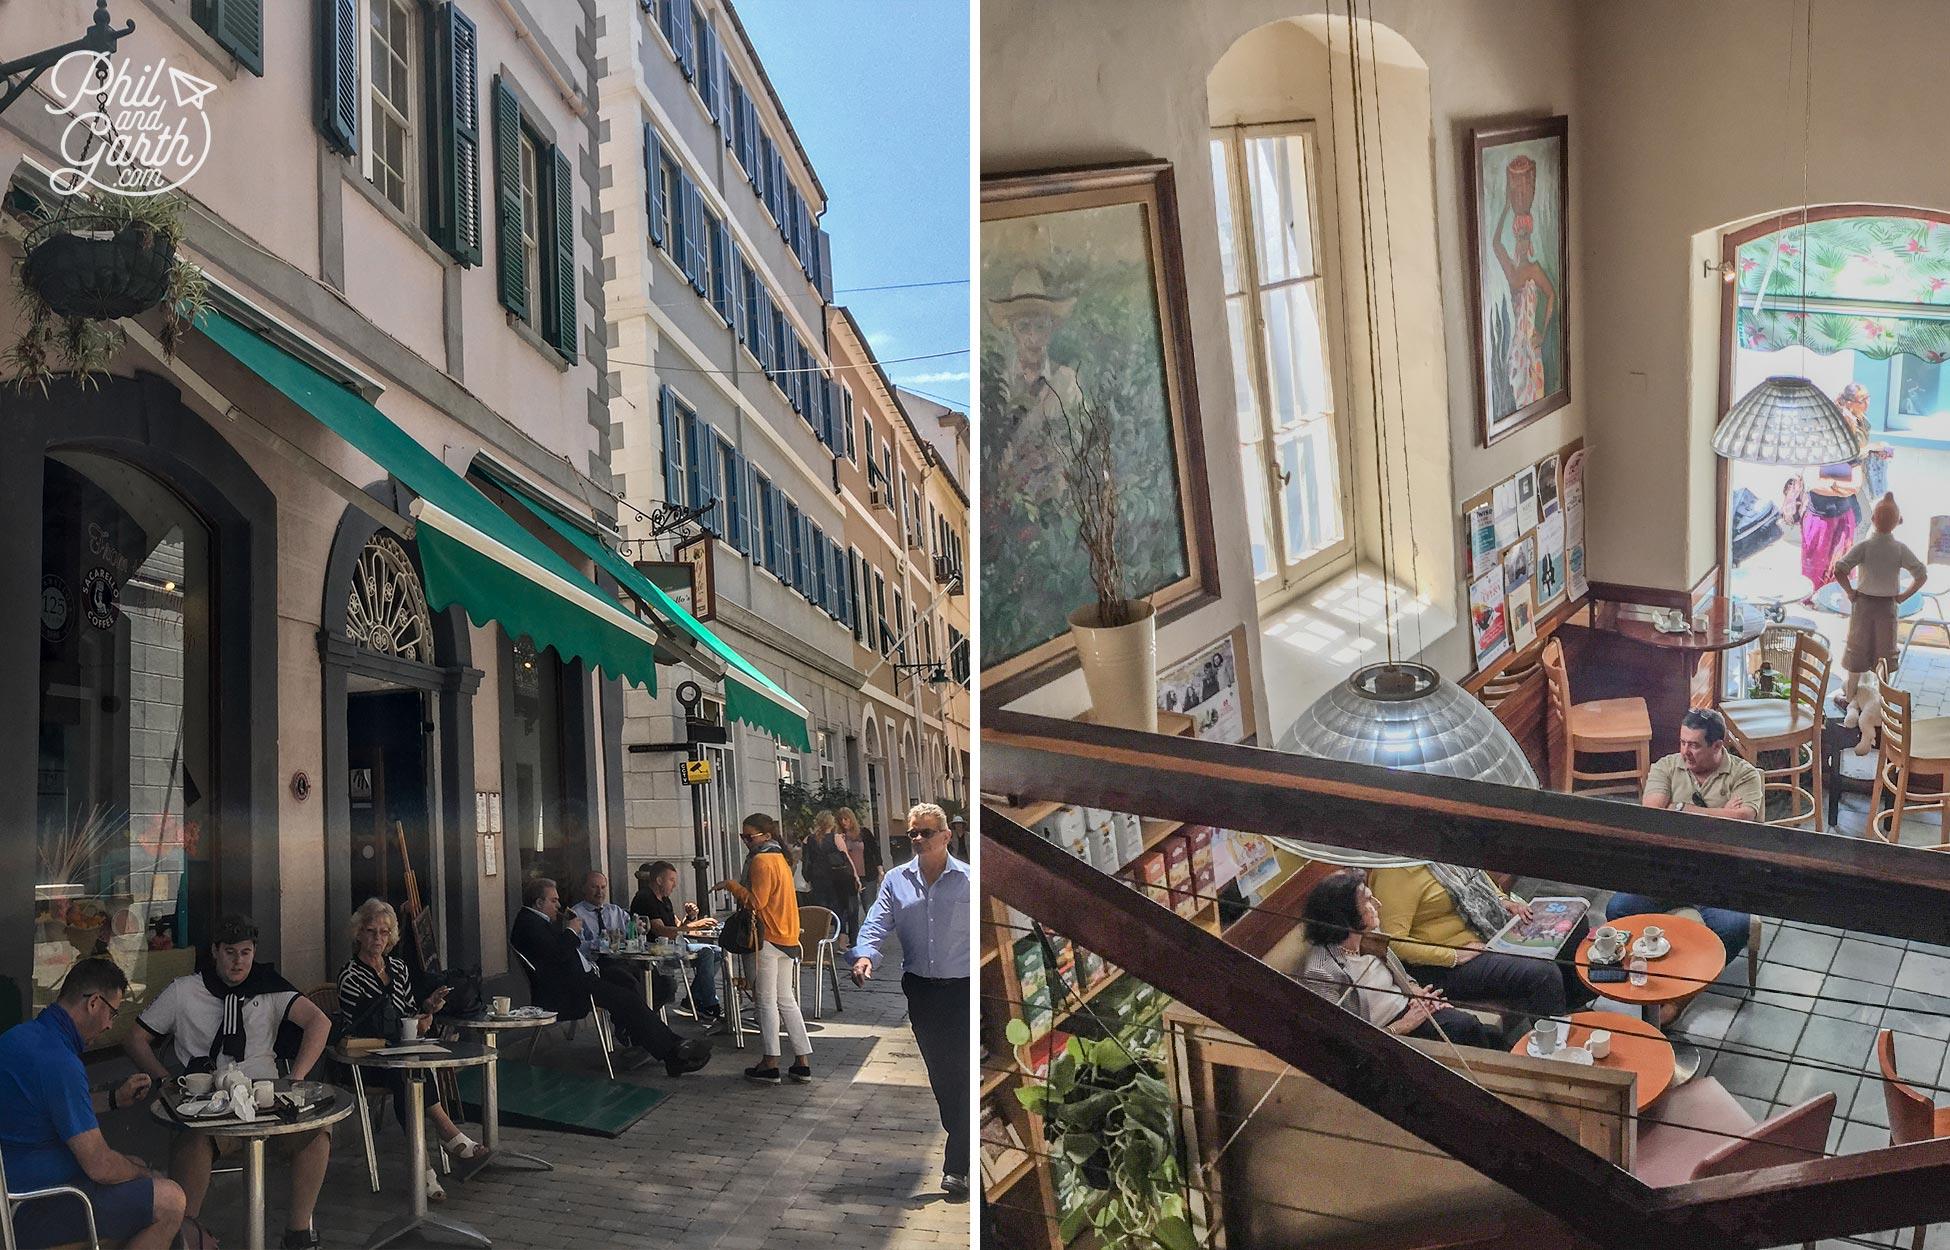 Sacarellos in Irish Town for deli food and coffee